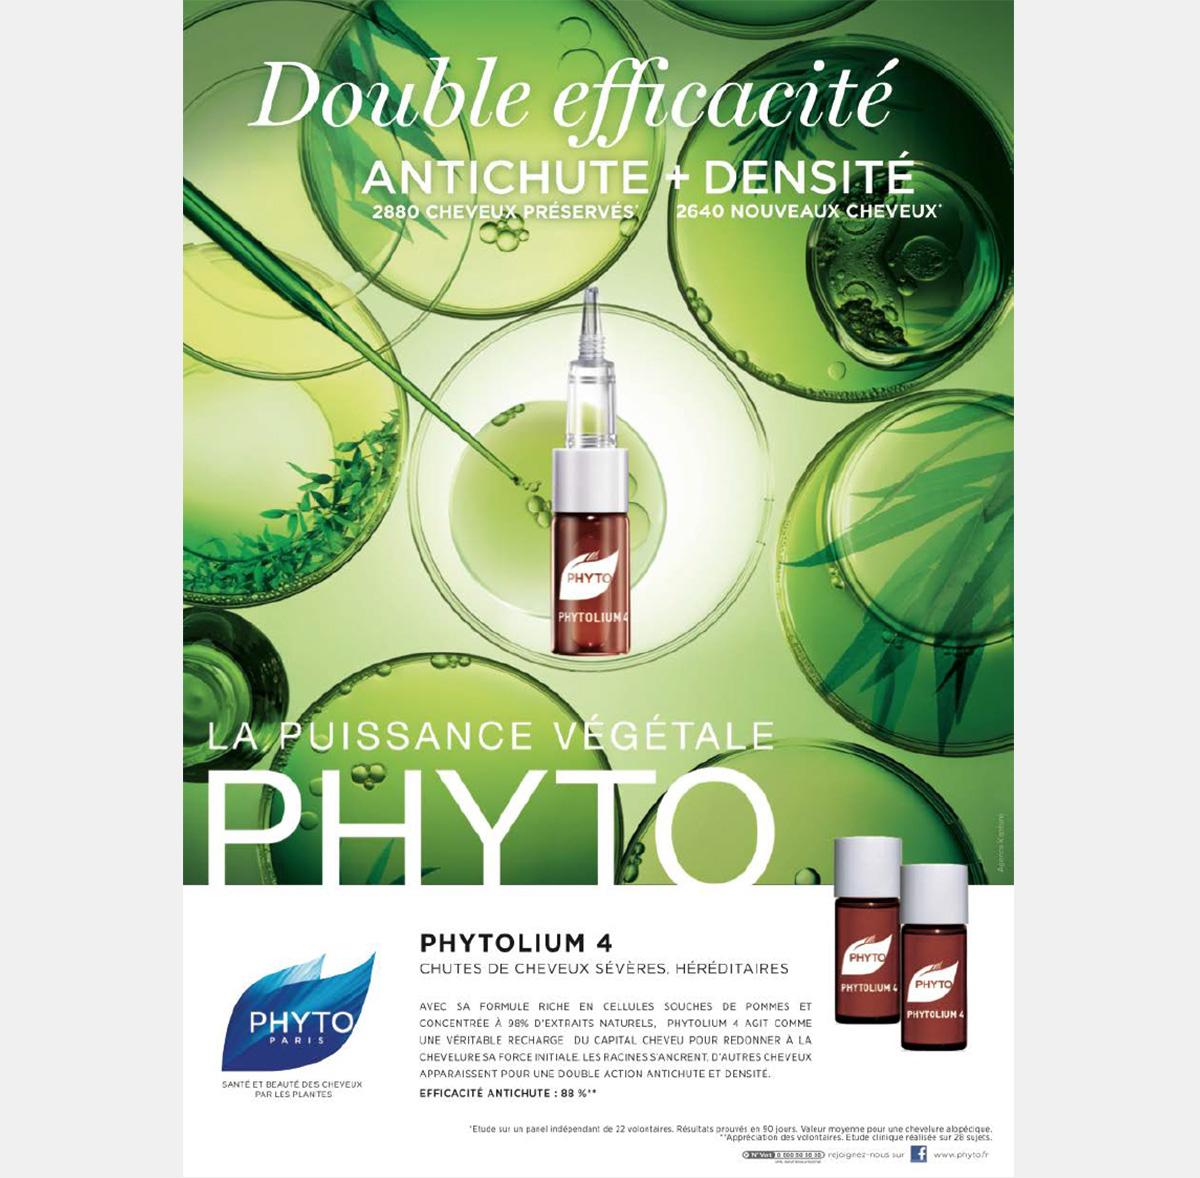 phyto20